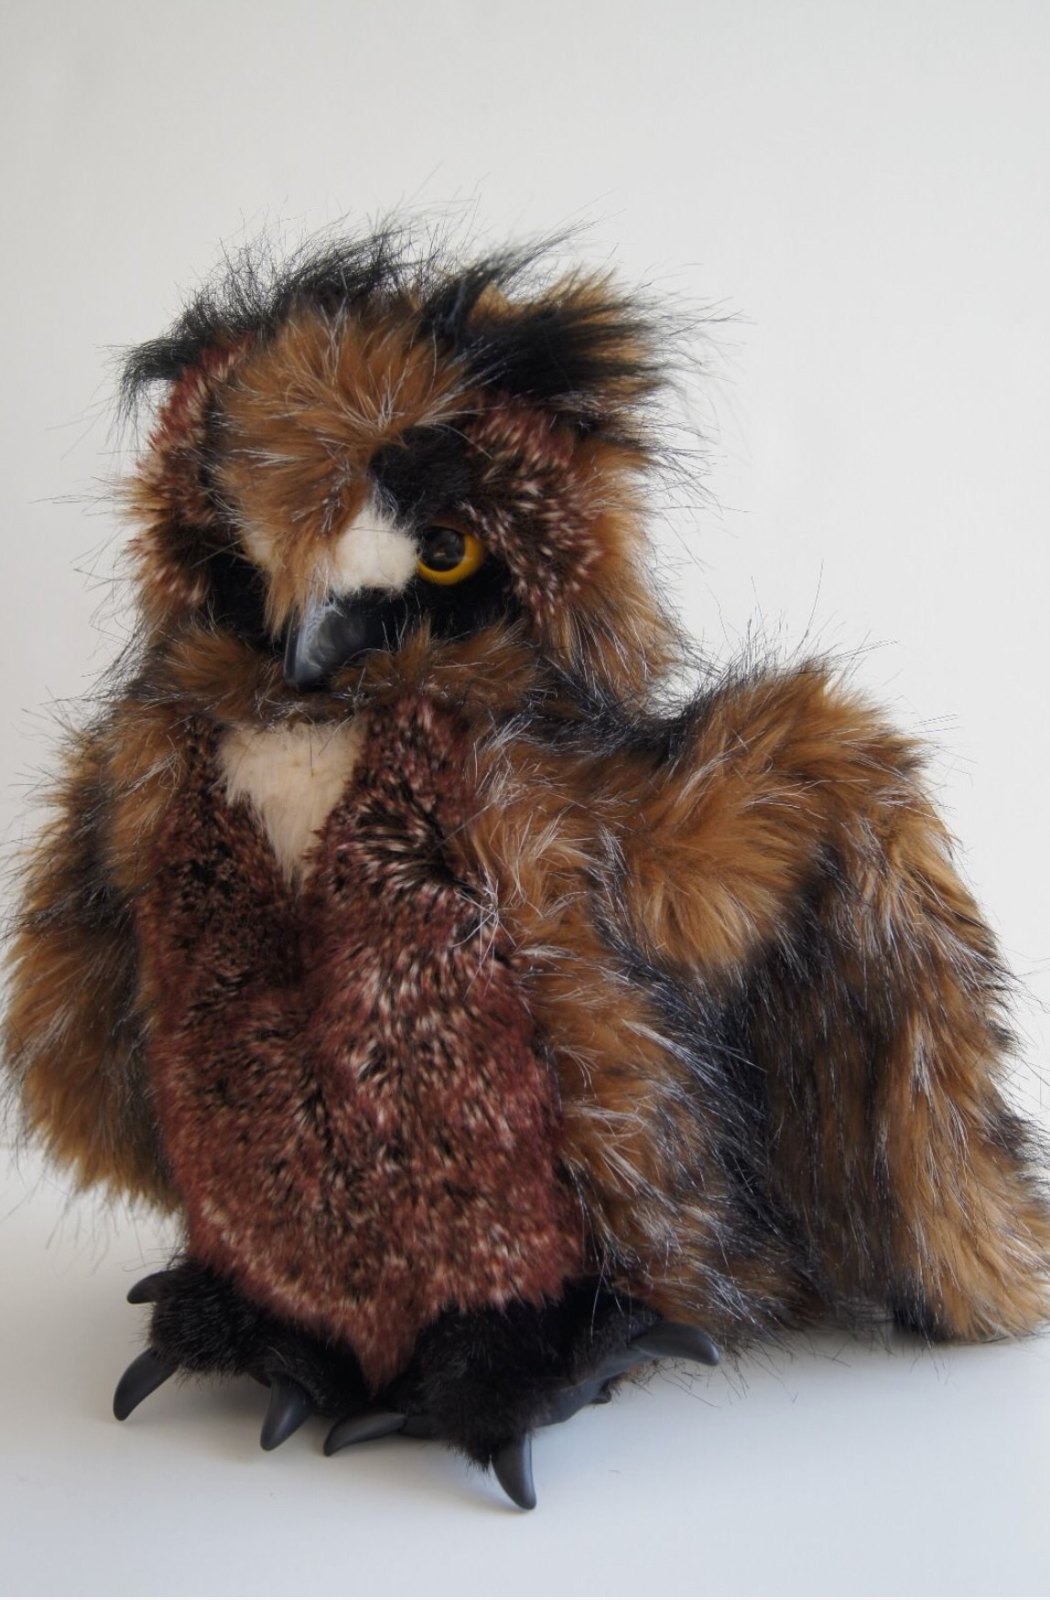 NEW Folkmanis Great Horned Owl Full Hand Puppet Plush Toy